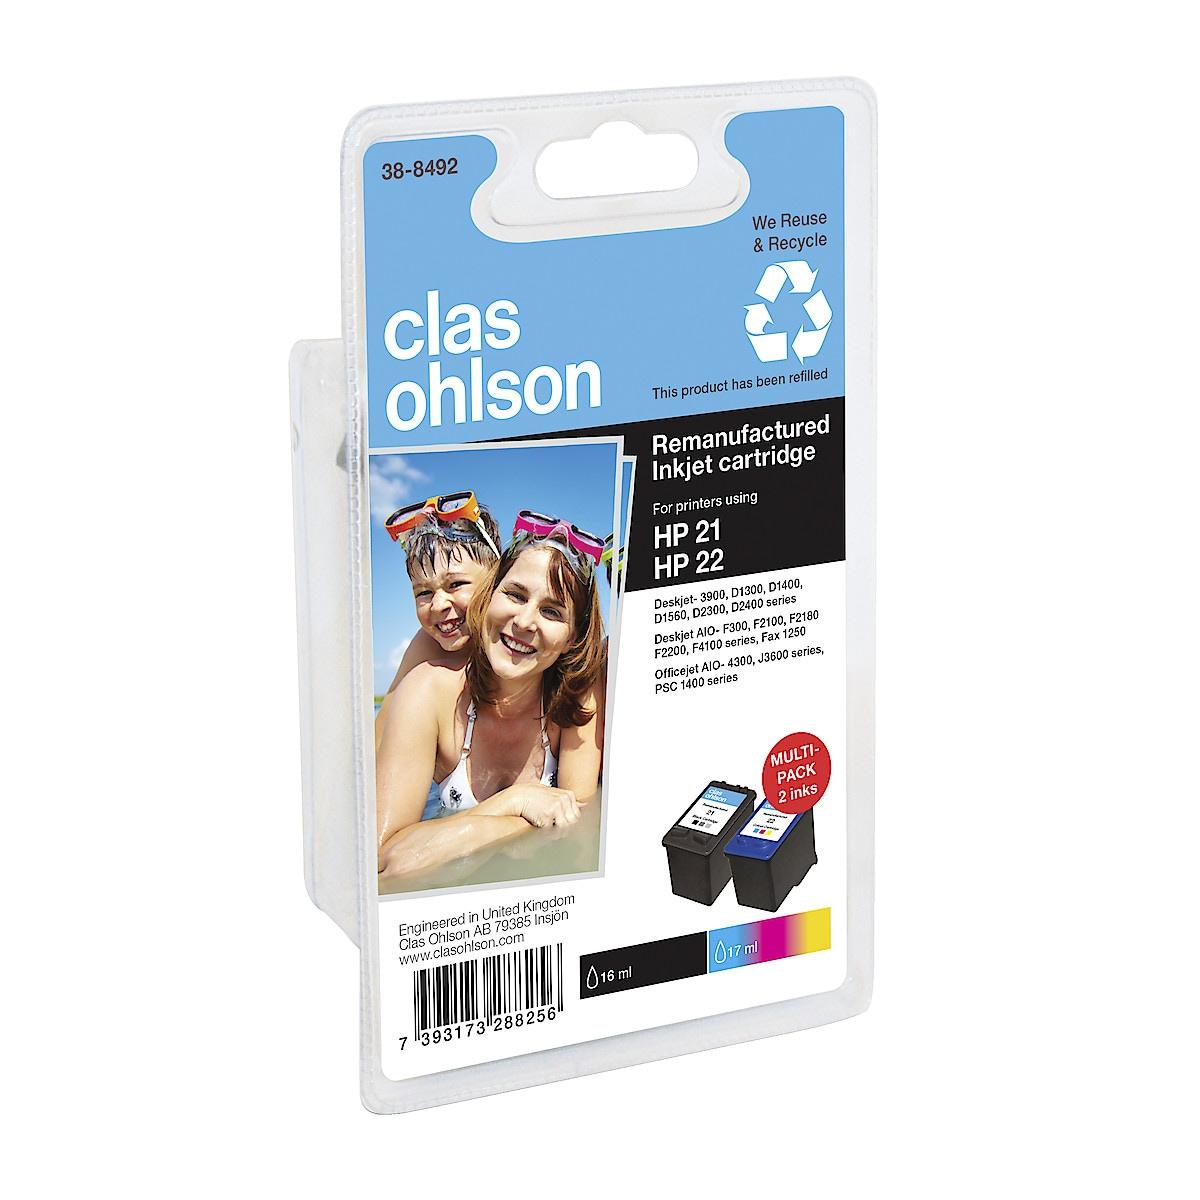 Bläckpatron HP 21 / 22 XL Clas Ohlson